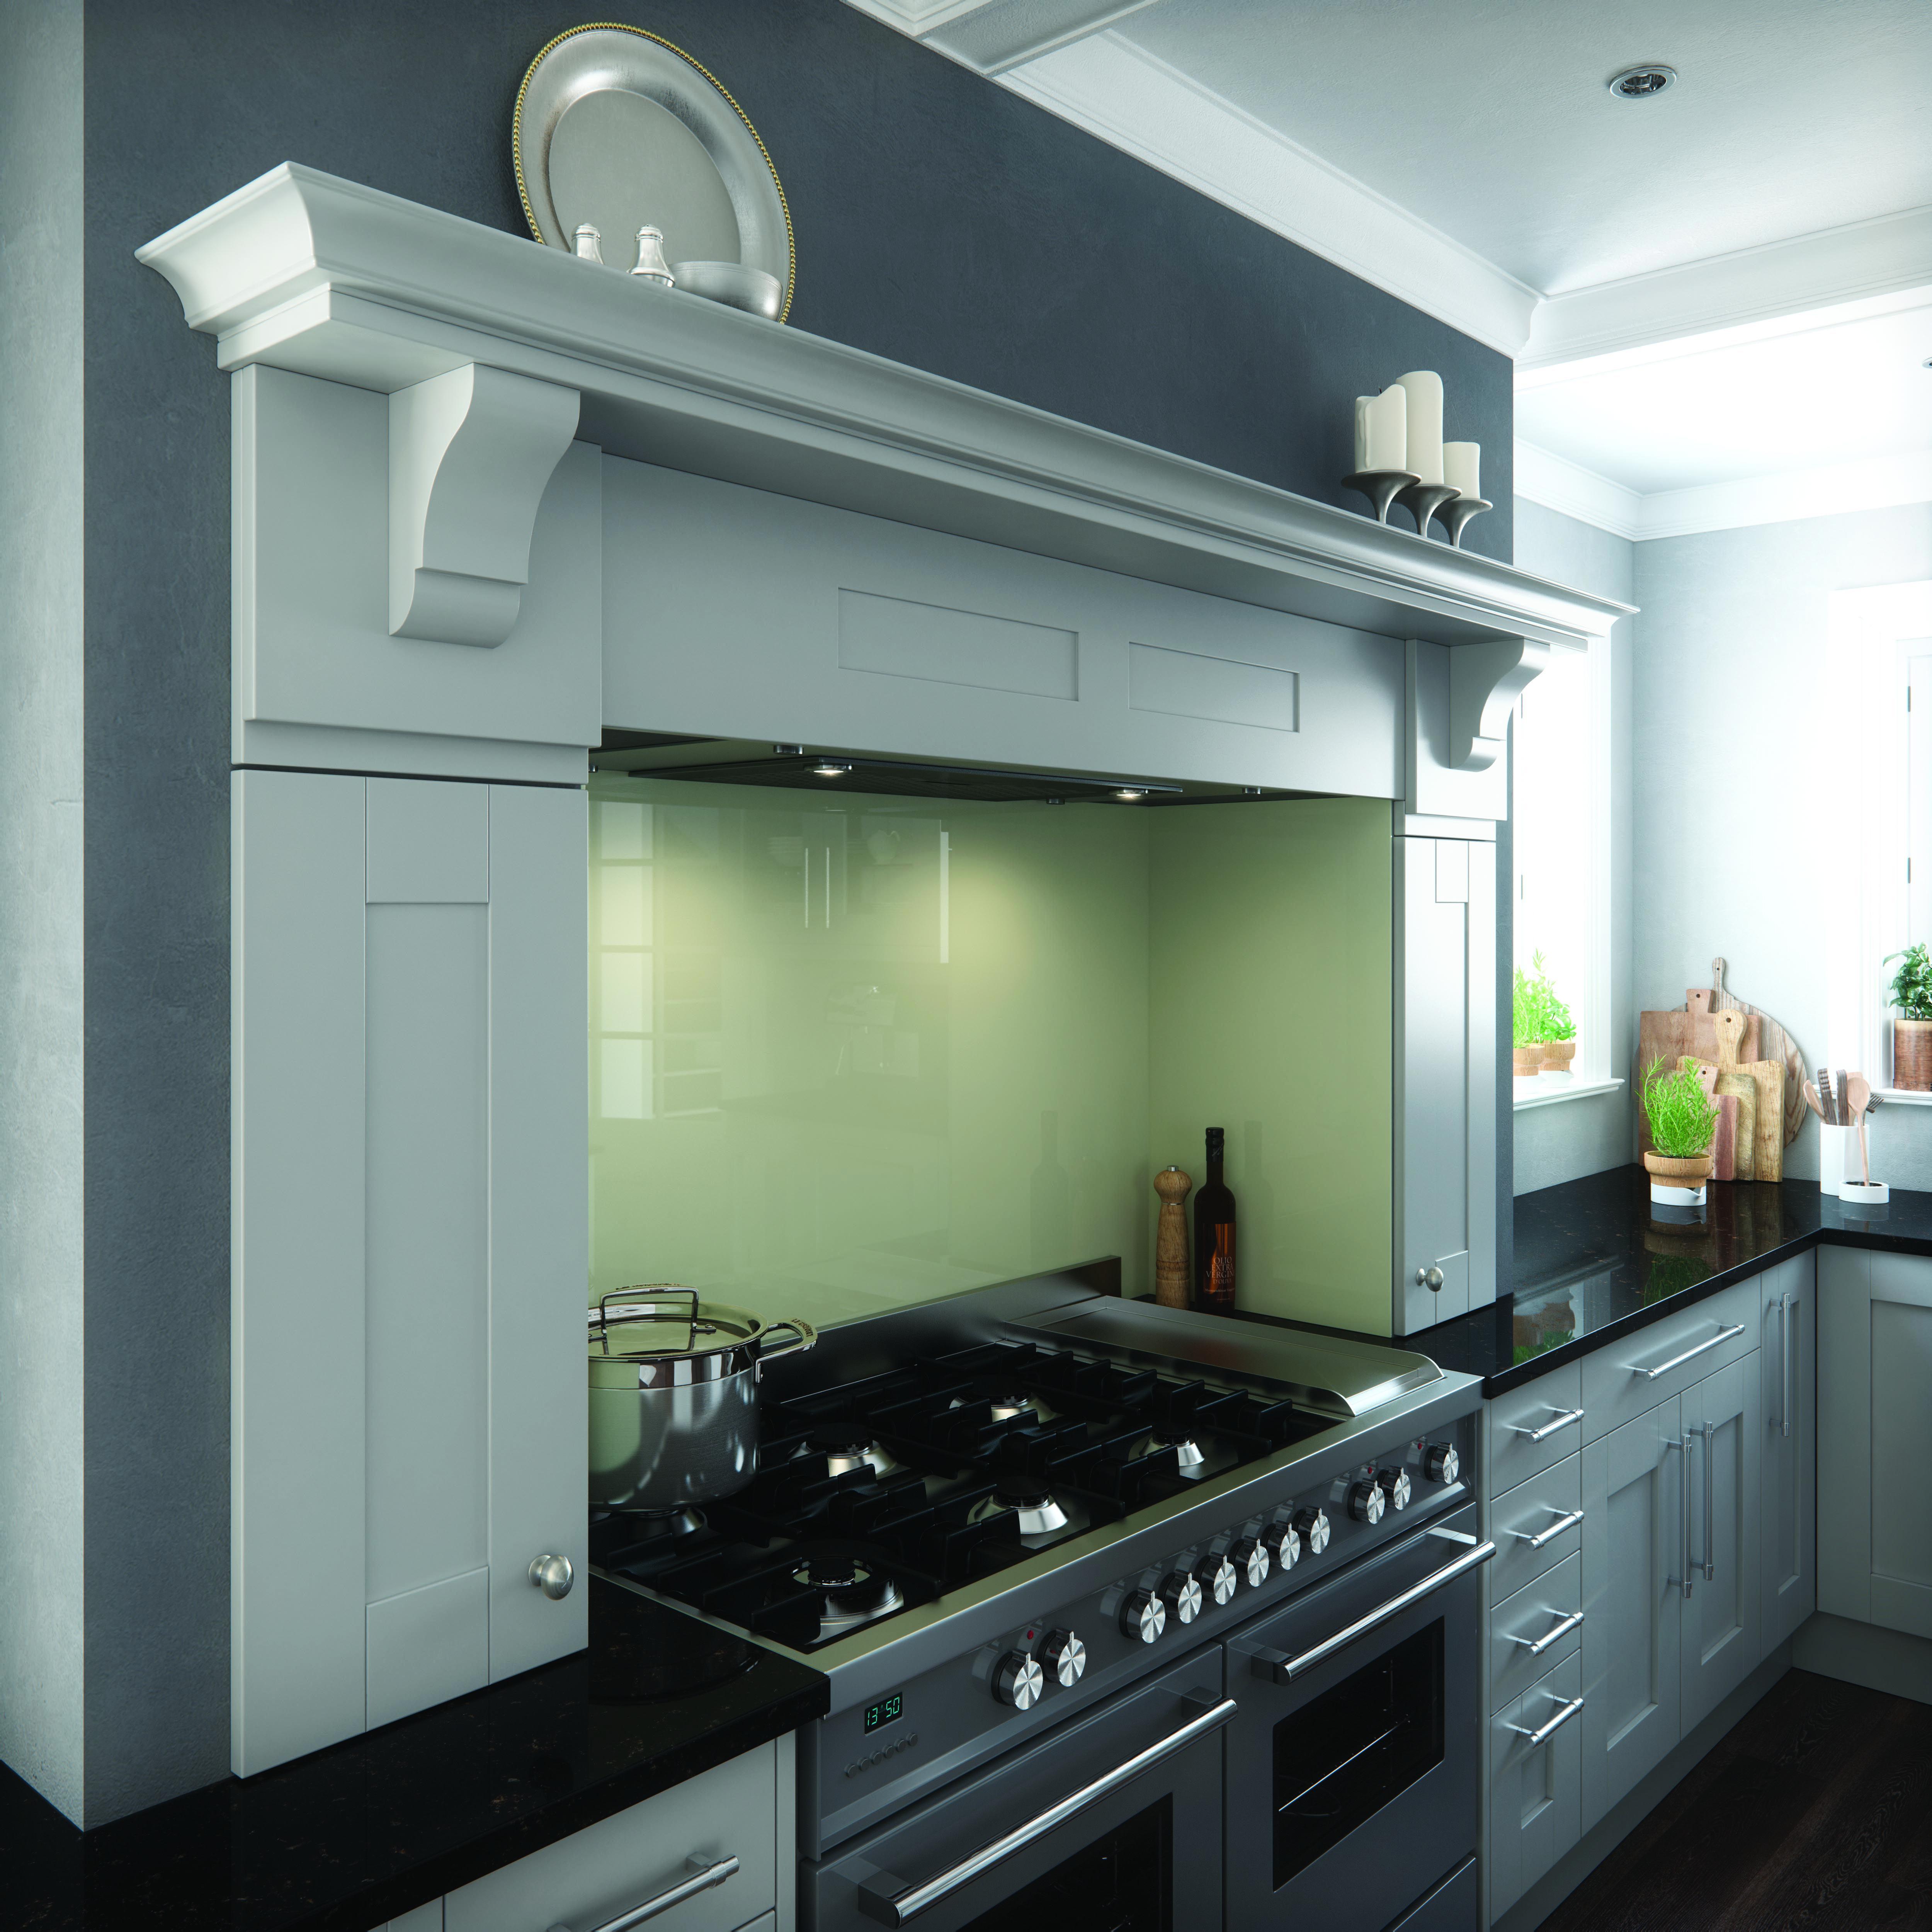 Feature Traditional Mantle | Mereway Kitchens | Pinterest | Mantle ...